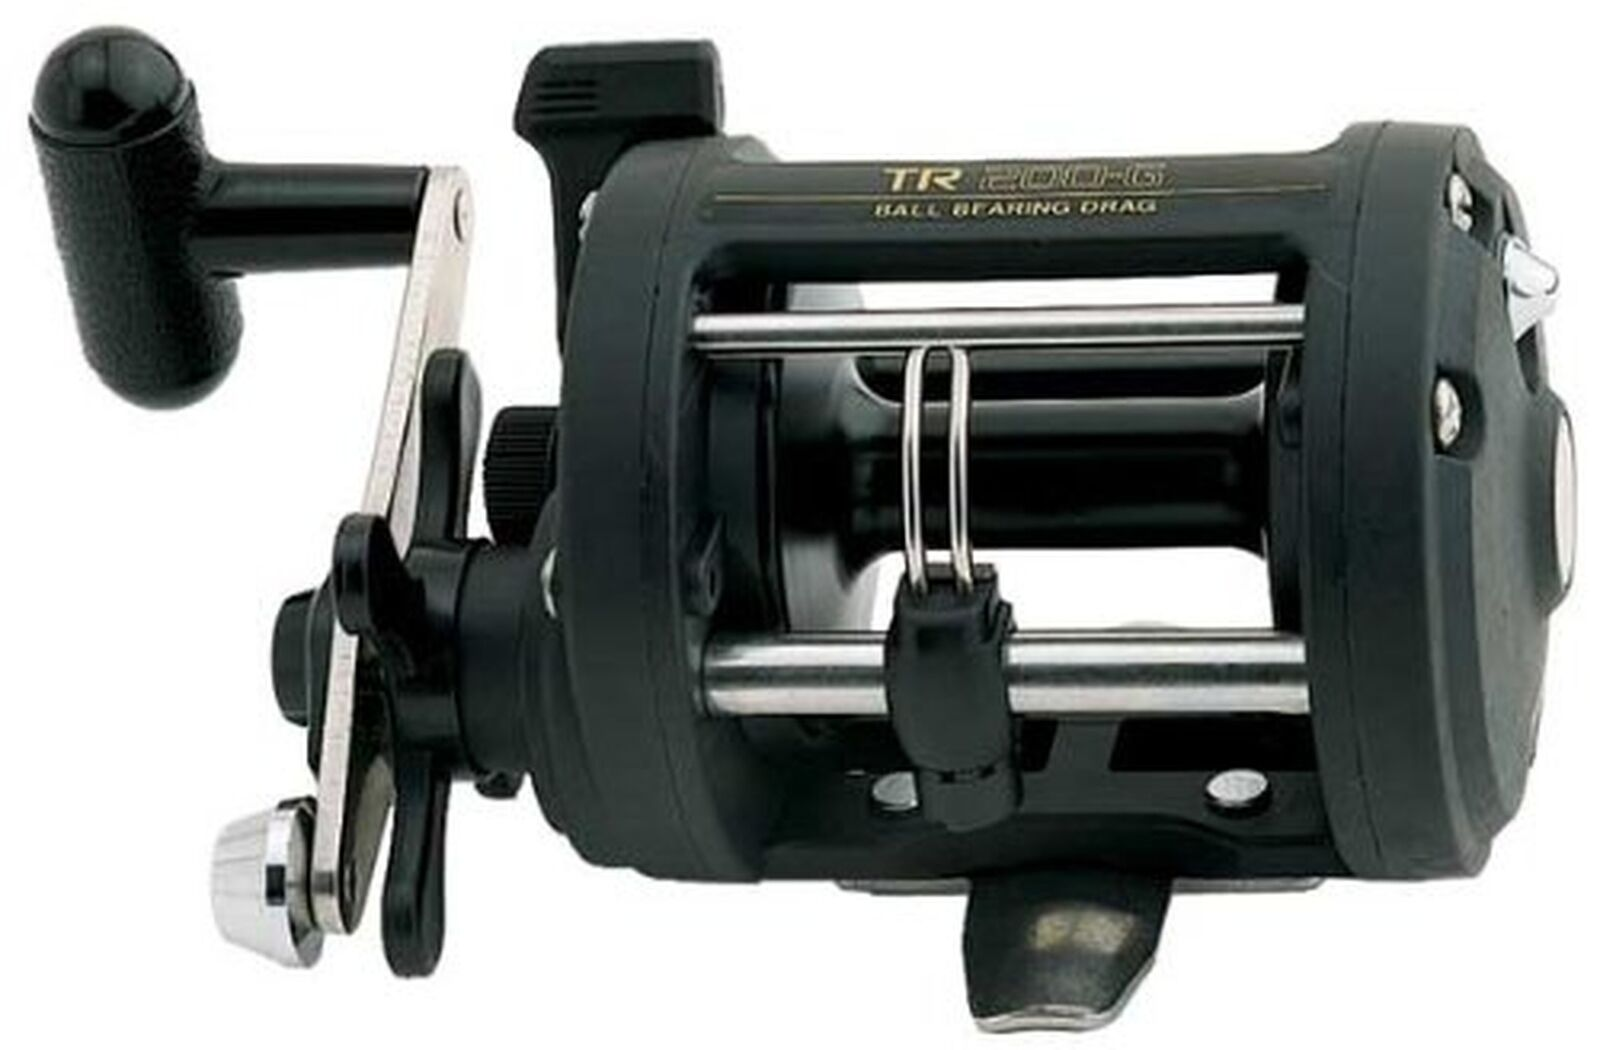 Shimano TRN 100 G Levelwind Star Drag Multiplier Fishing Reel RightHand, TR100G